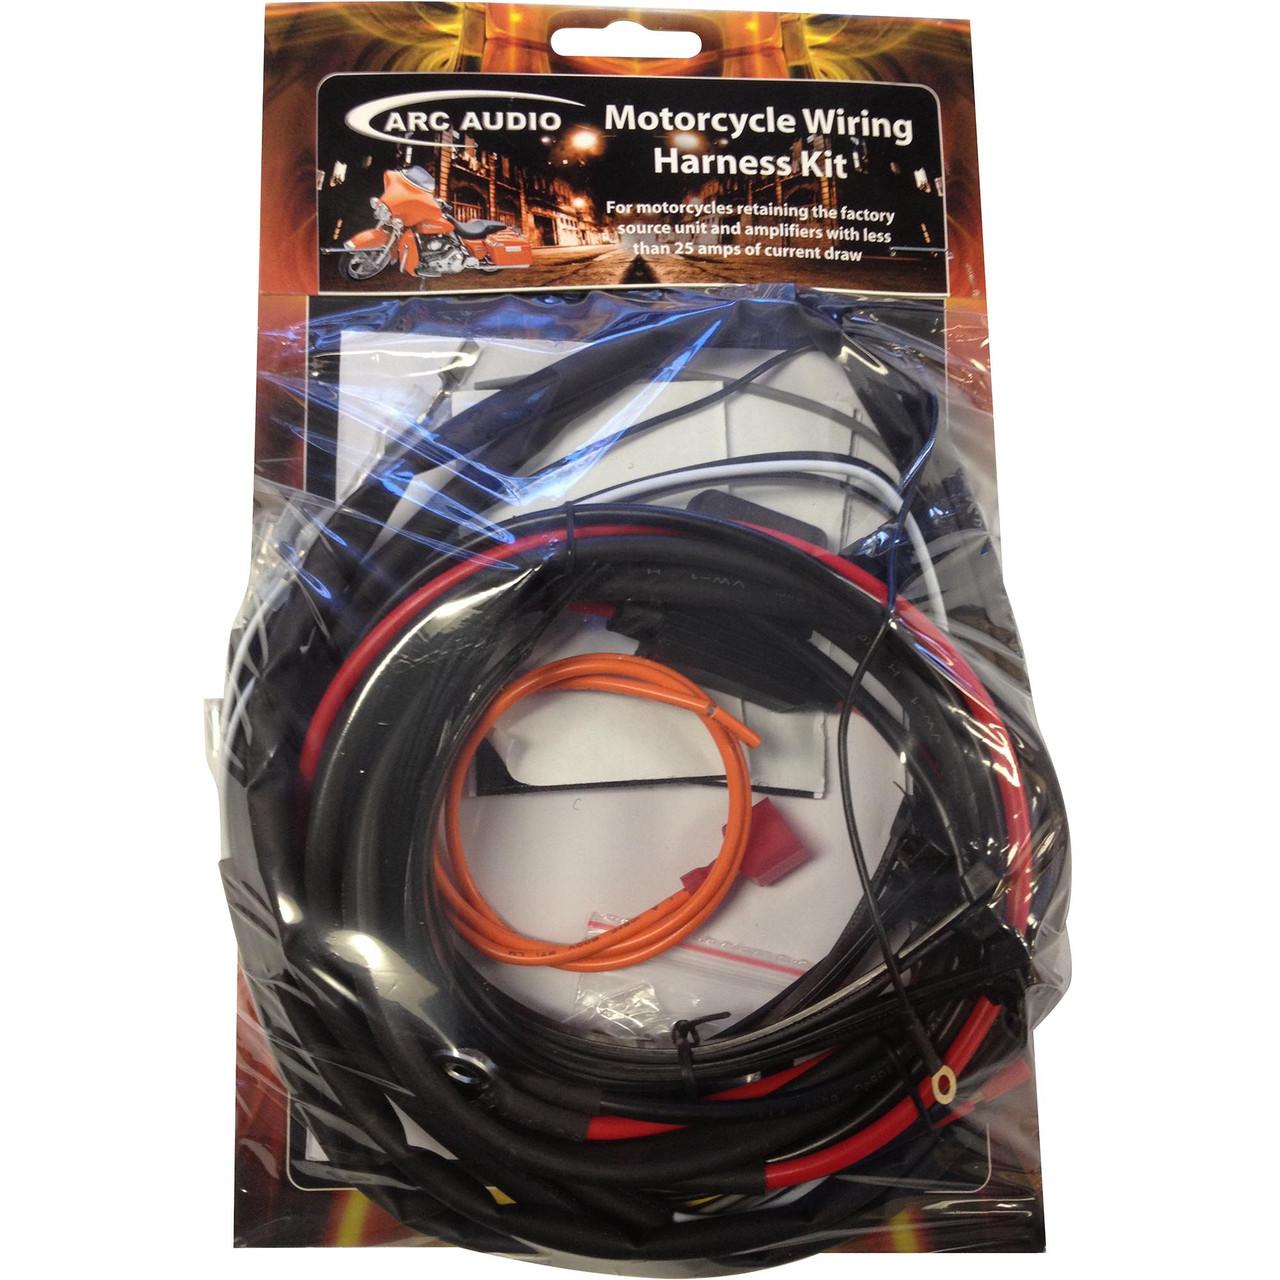 arc wiring harness images gallery arc wiring harness wiring diagrams rh 13 crocodilecruisedarwin com circuit breaker box wiring diagram arc fault [ 874 x 1280 Pixel ]